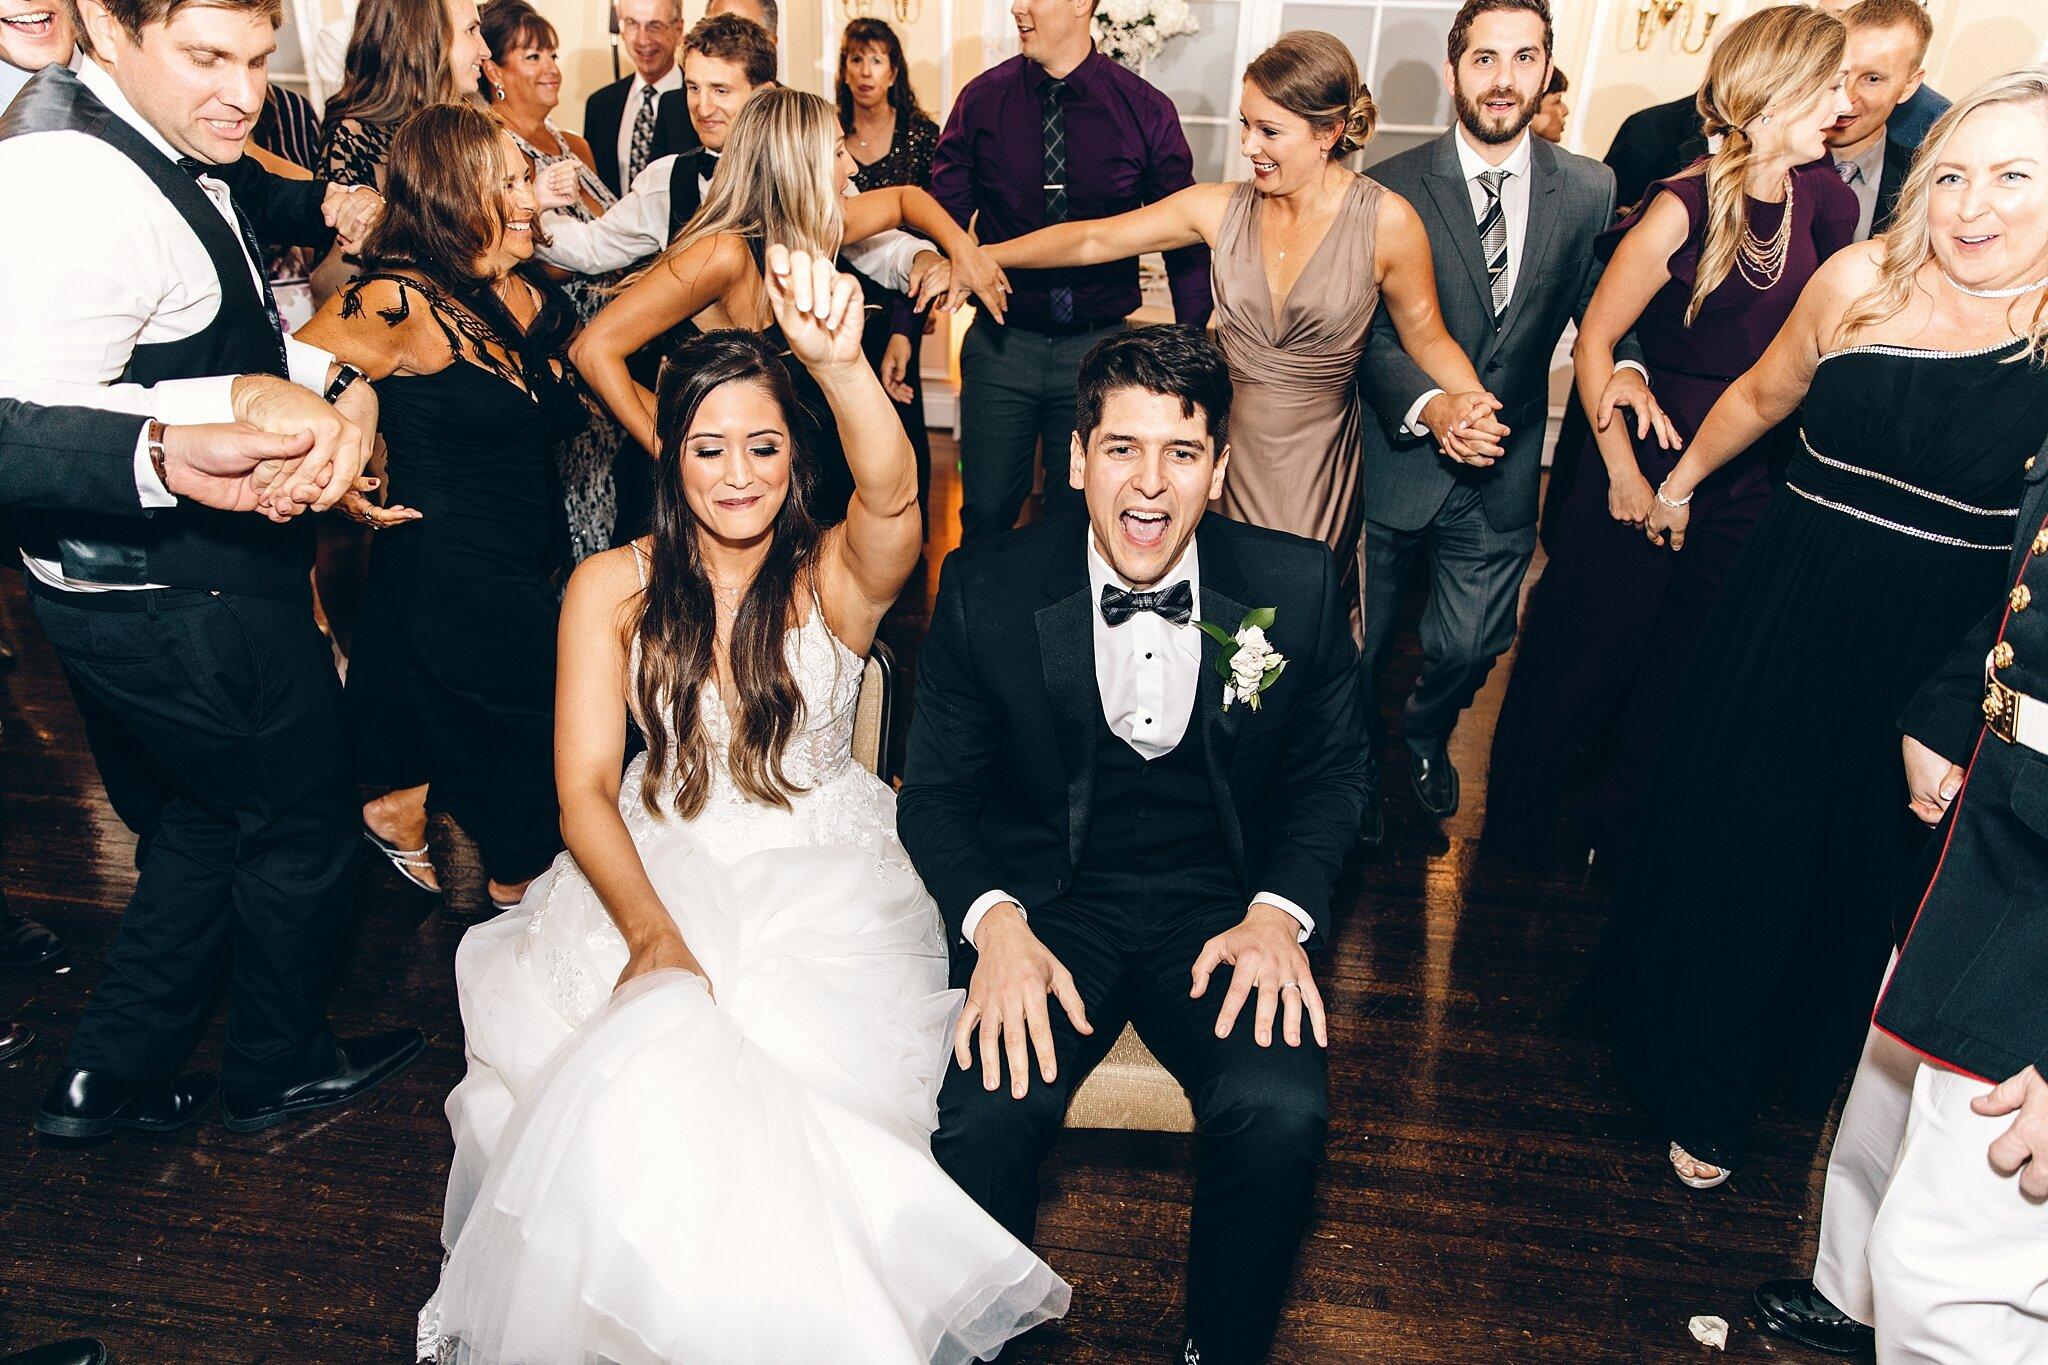 patrick-henry-ballroom-wedding-roanoke_0540.jpg